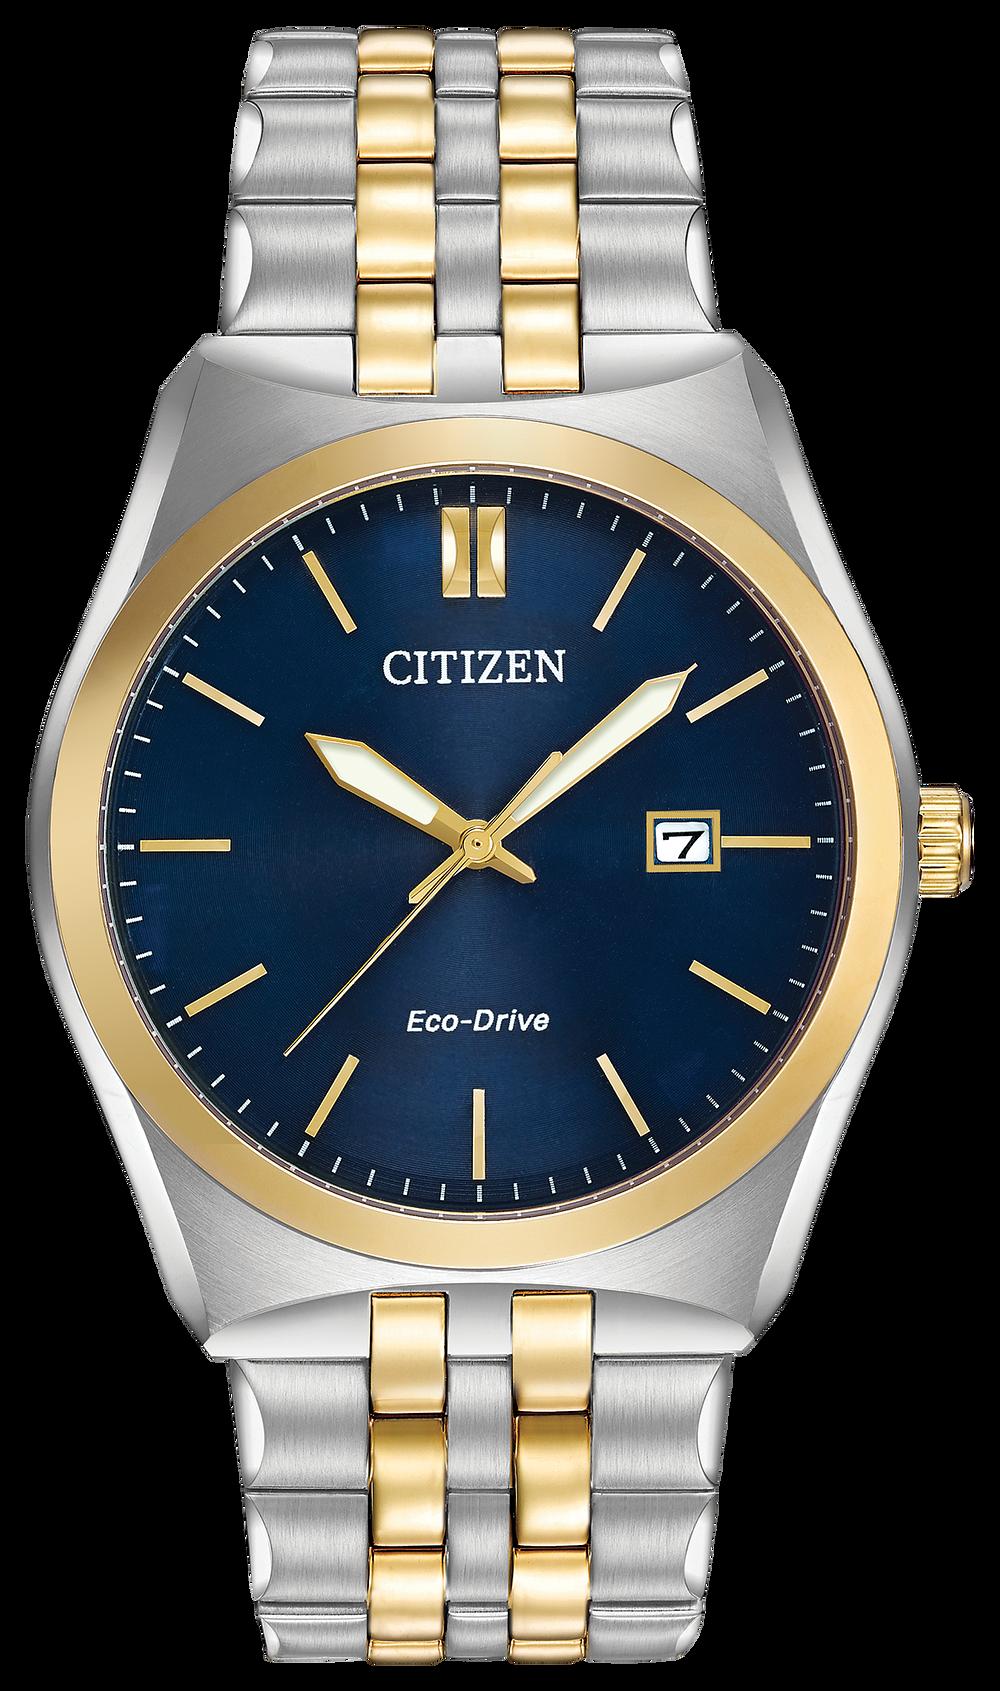 5147db06892 Corso - Men s Eco-Drive BM7334-58L Two Tone Blue Dial Watch